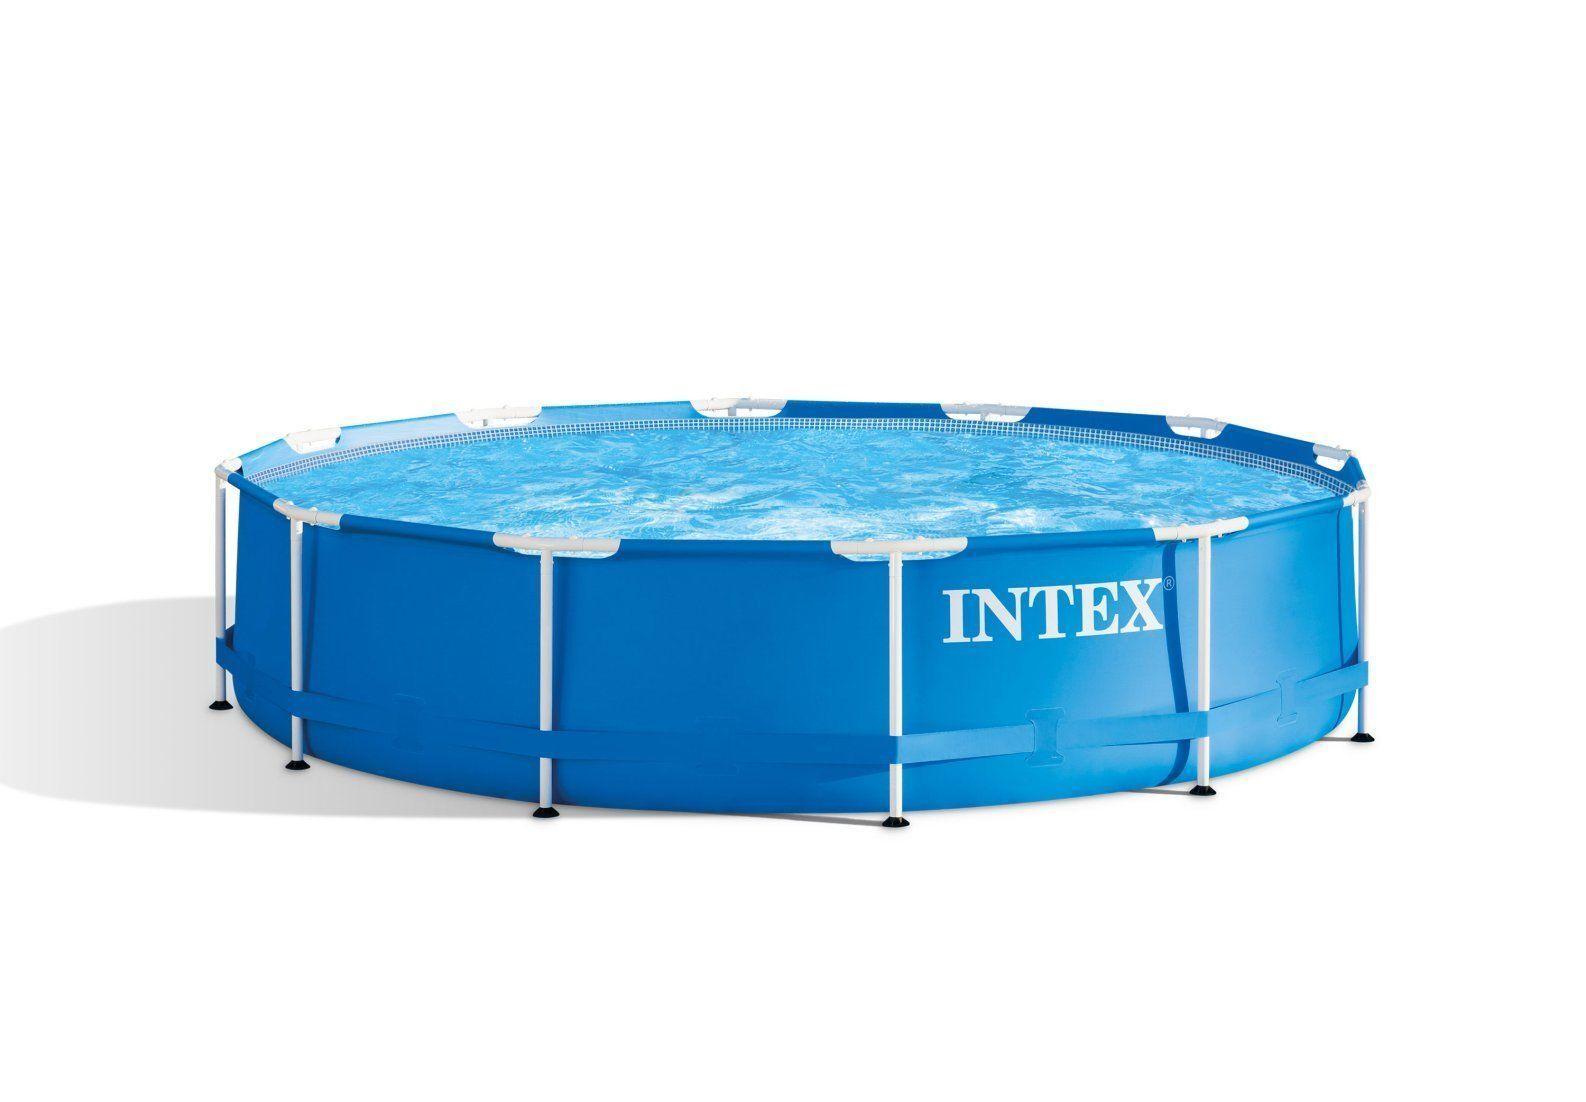 Intex 28210NP Metallrahmen Pool - 366x76cm, Blau   eBay